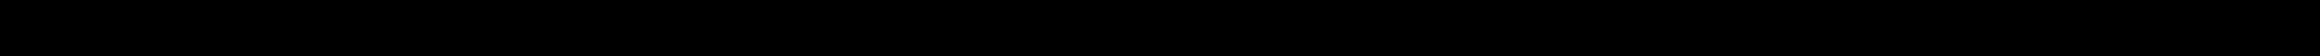 MAHLE ORIGINAL 68001297AA, K68001297AA, K68001297AA, 1118184, 12355851 Oljni filter